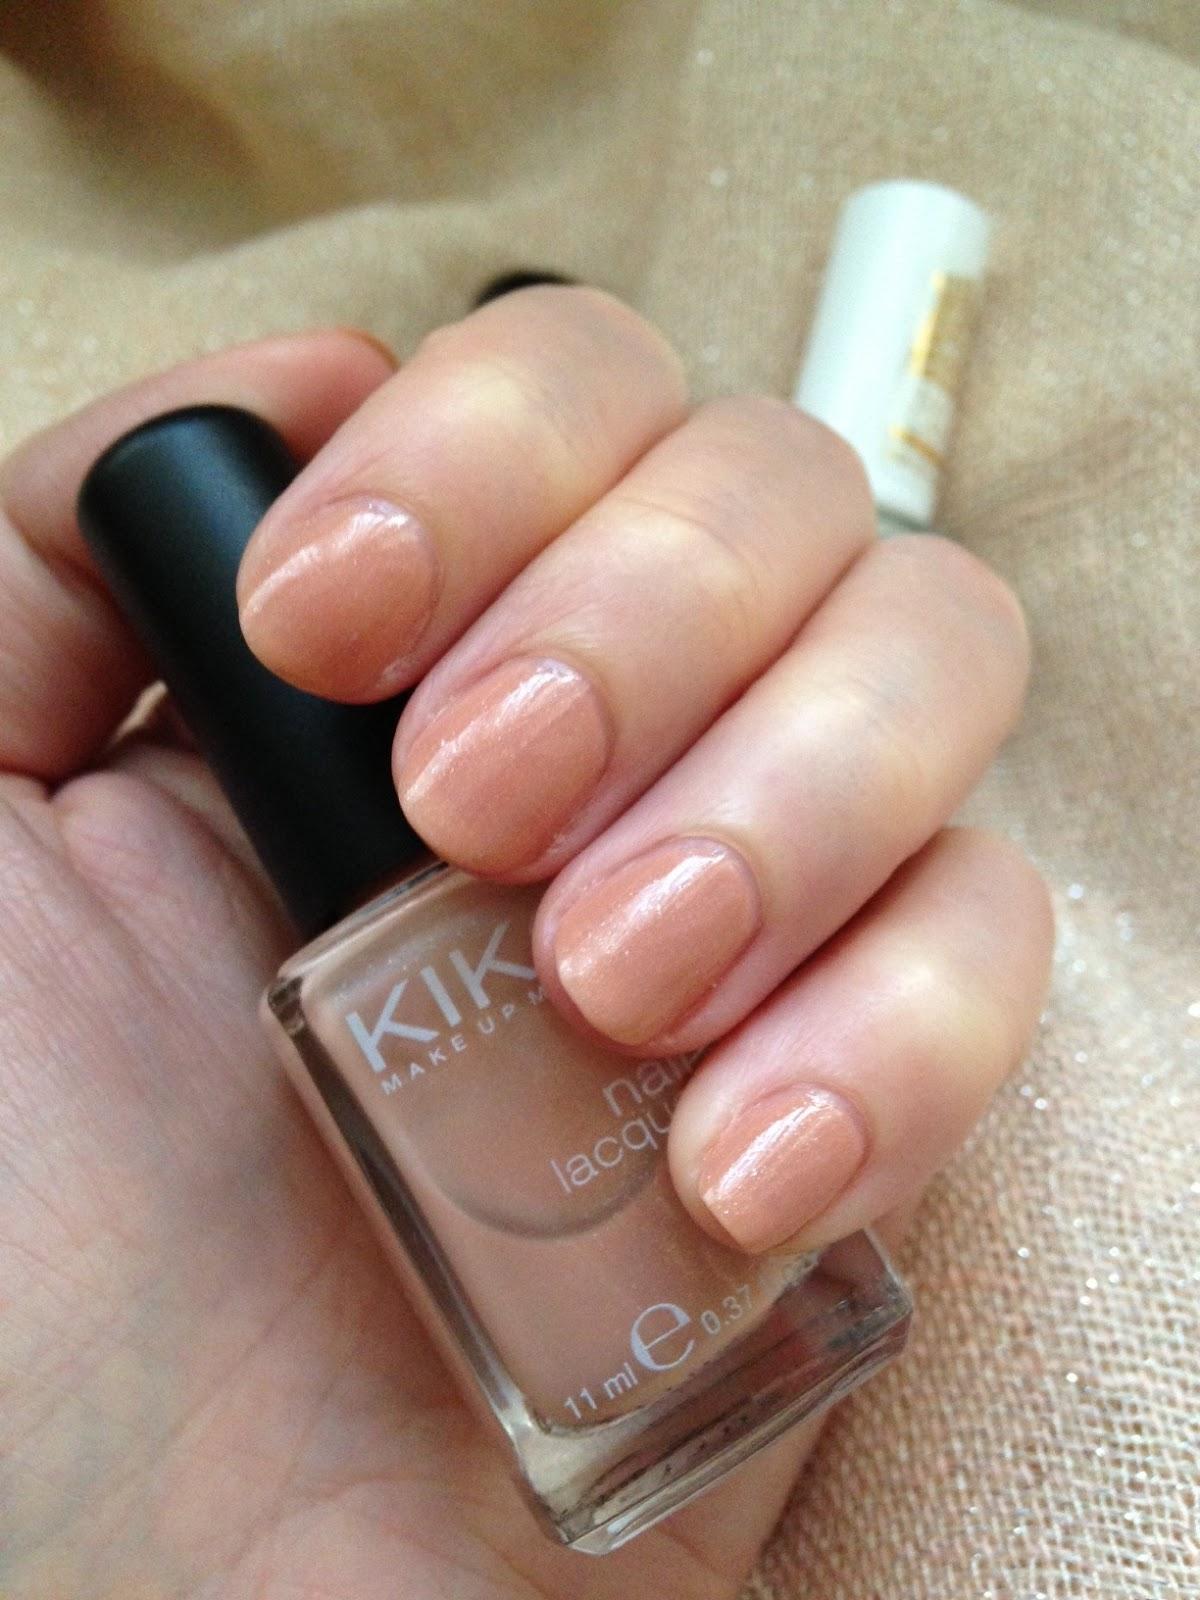 beautyorbread: New Beauty Find - Kiko Make up Milano